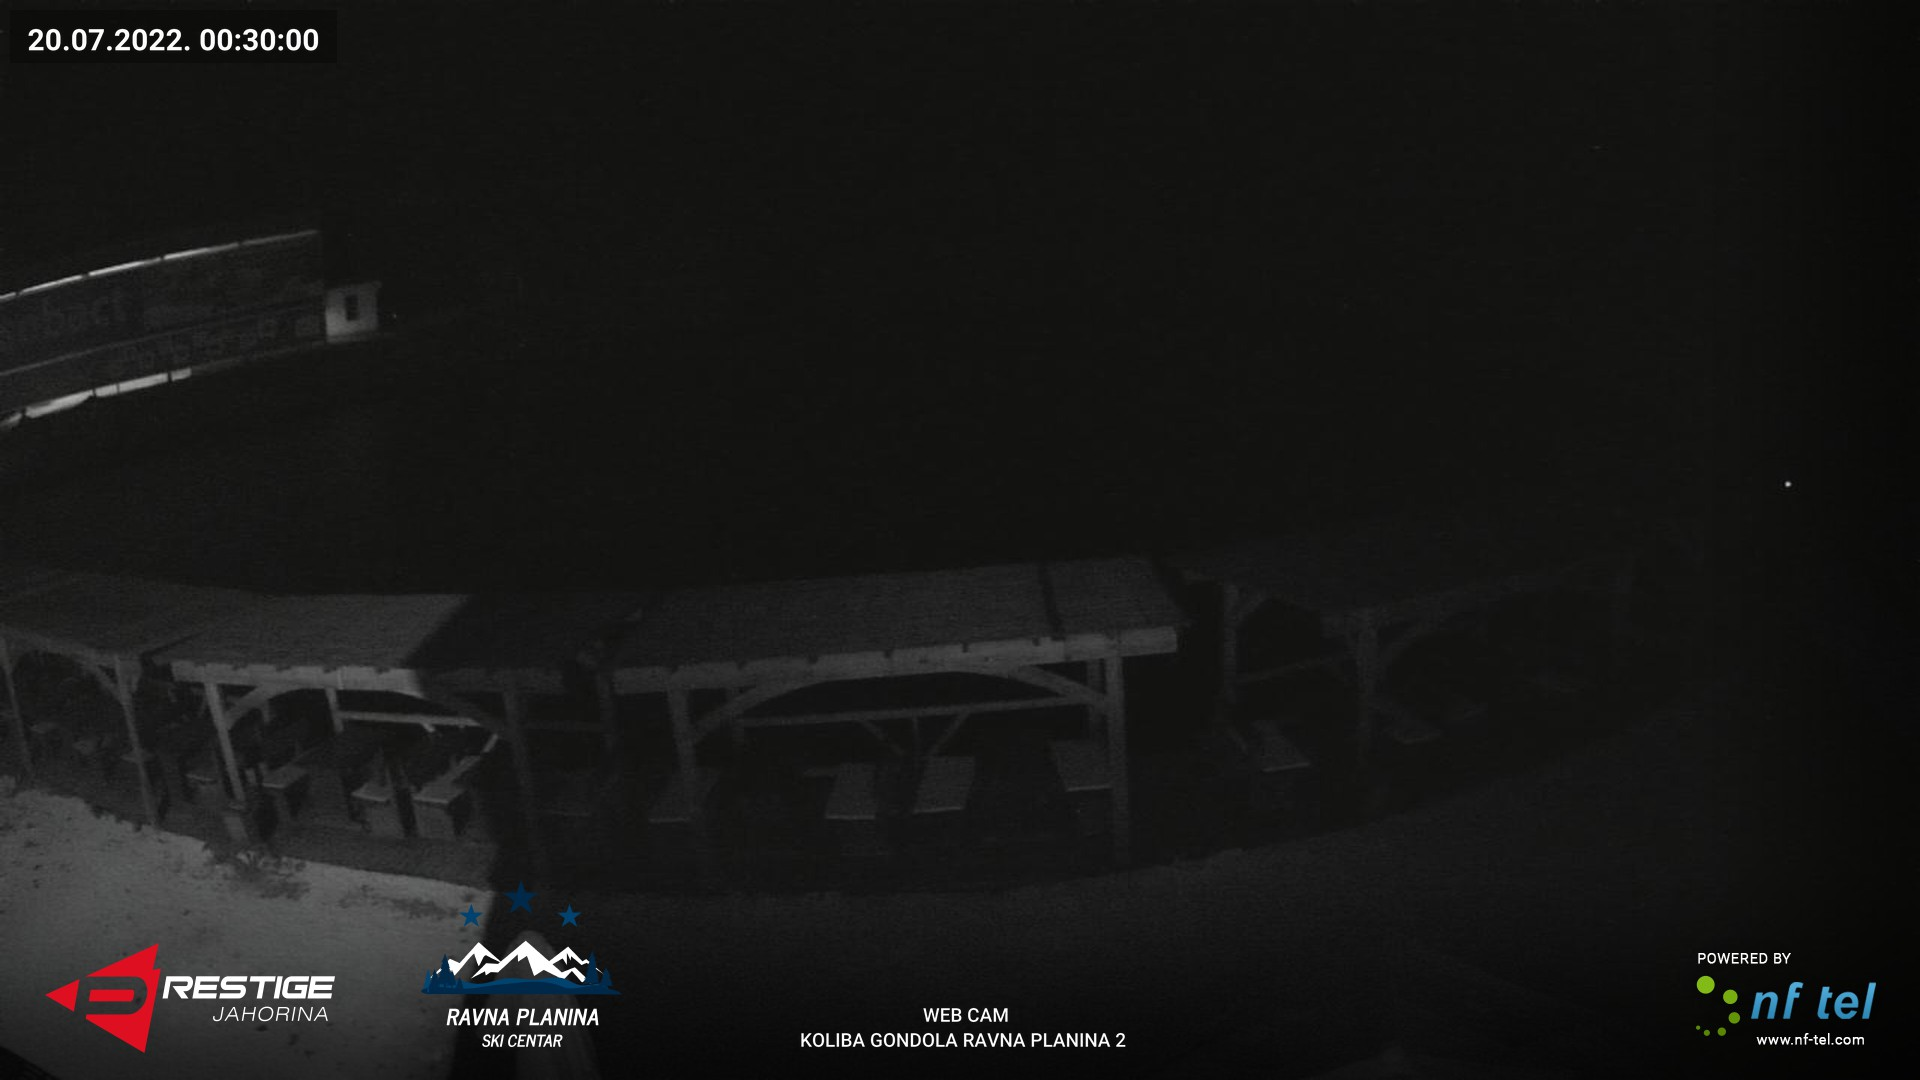 Web Kamera Gondola - Ravna planina